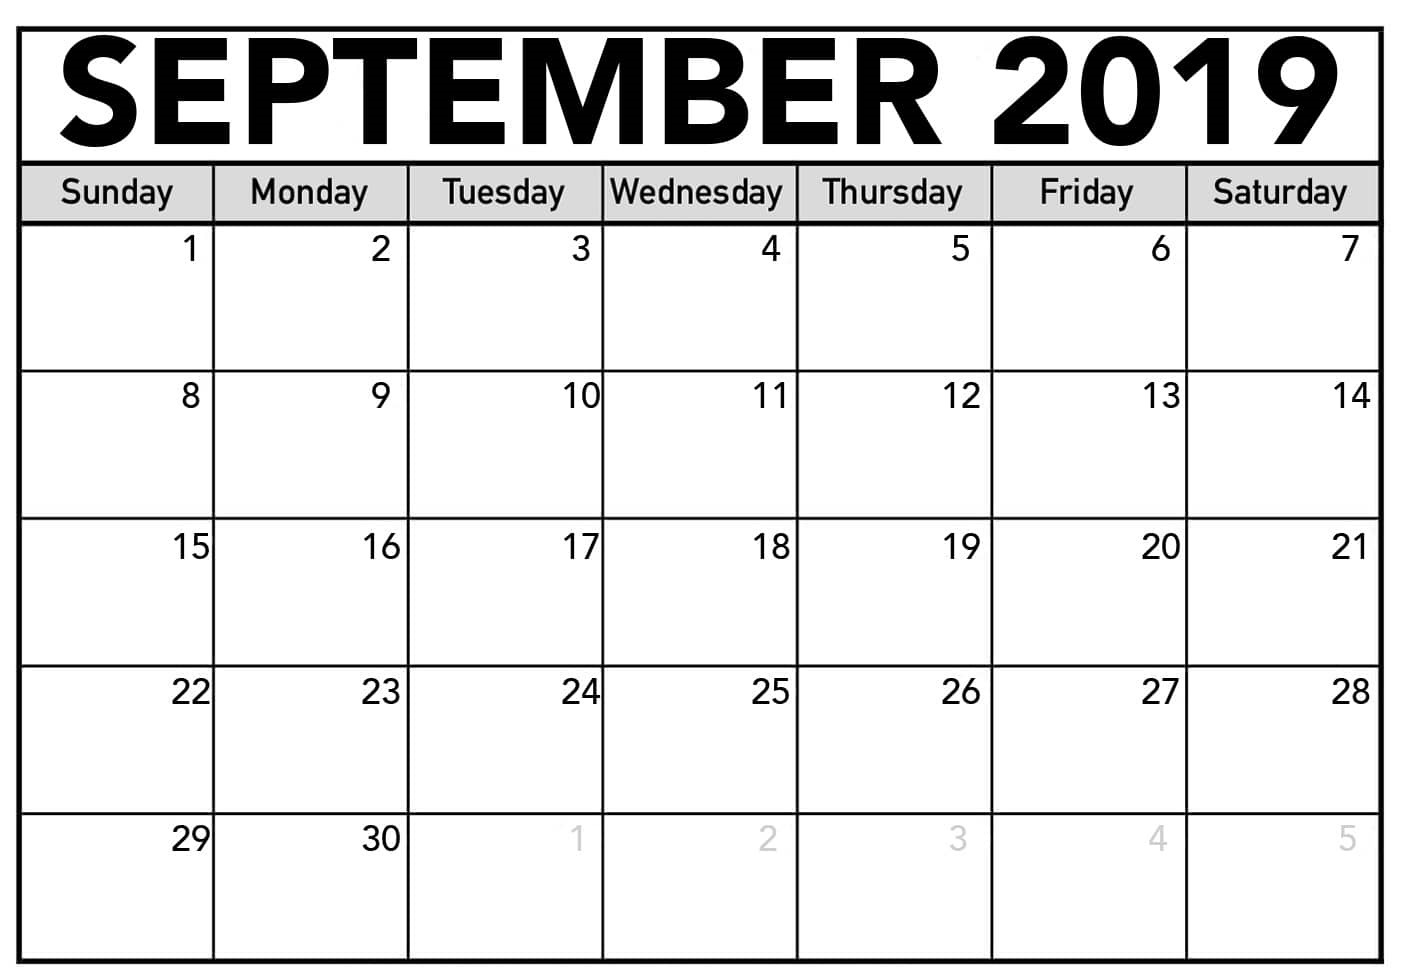 Free Printable September 2019 Calendar